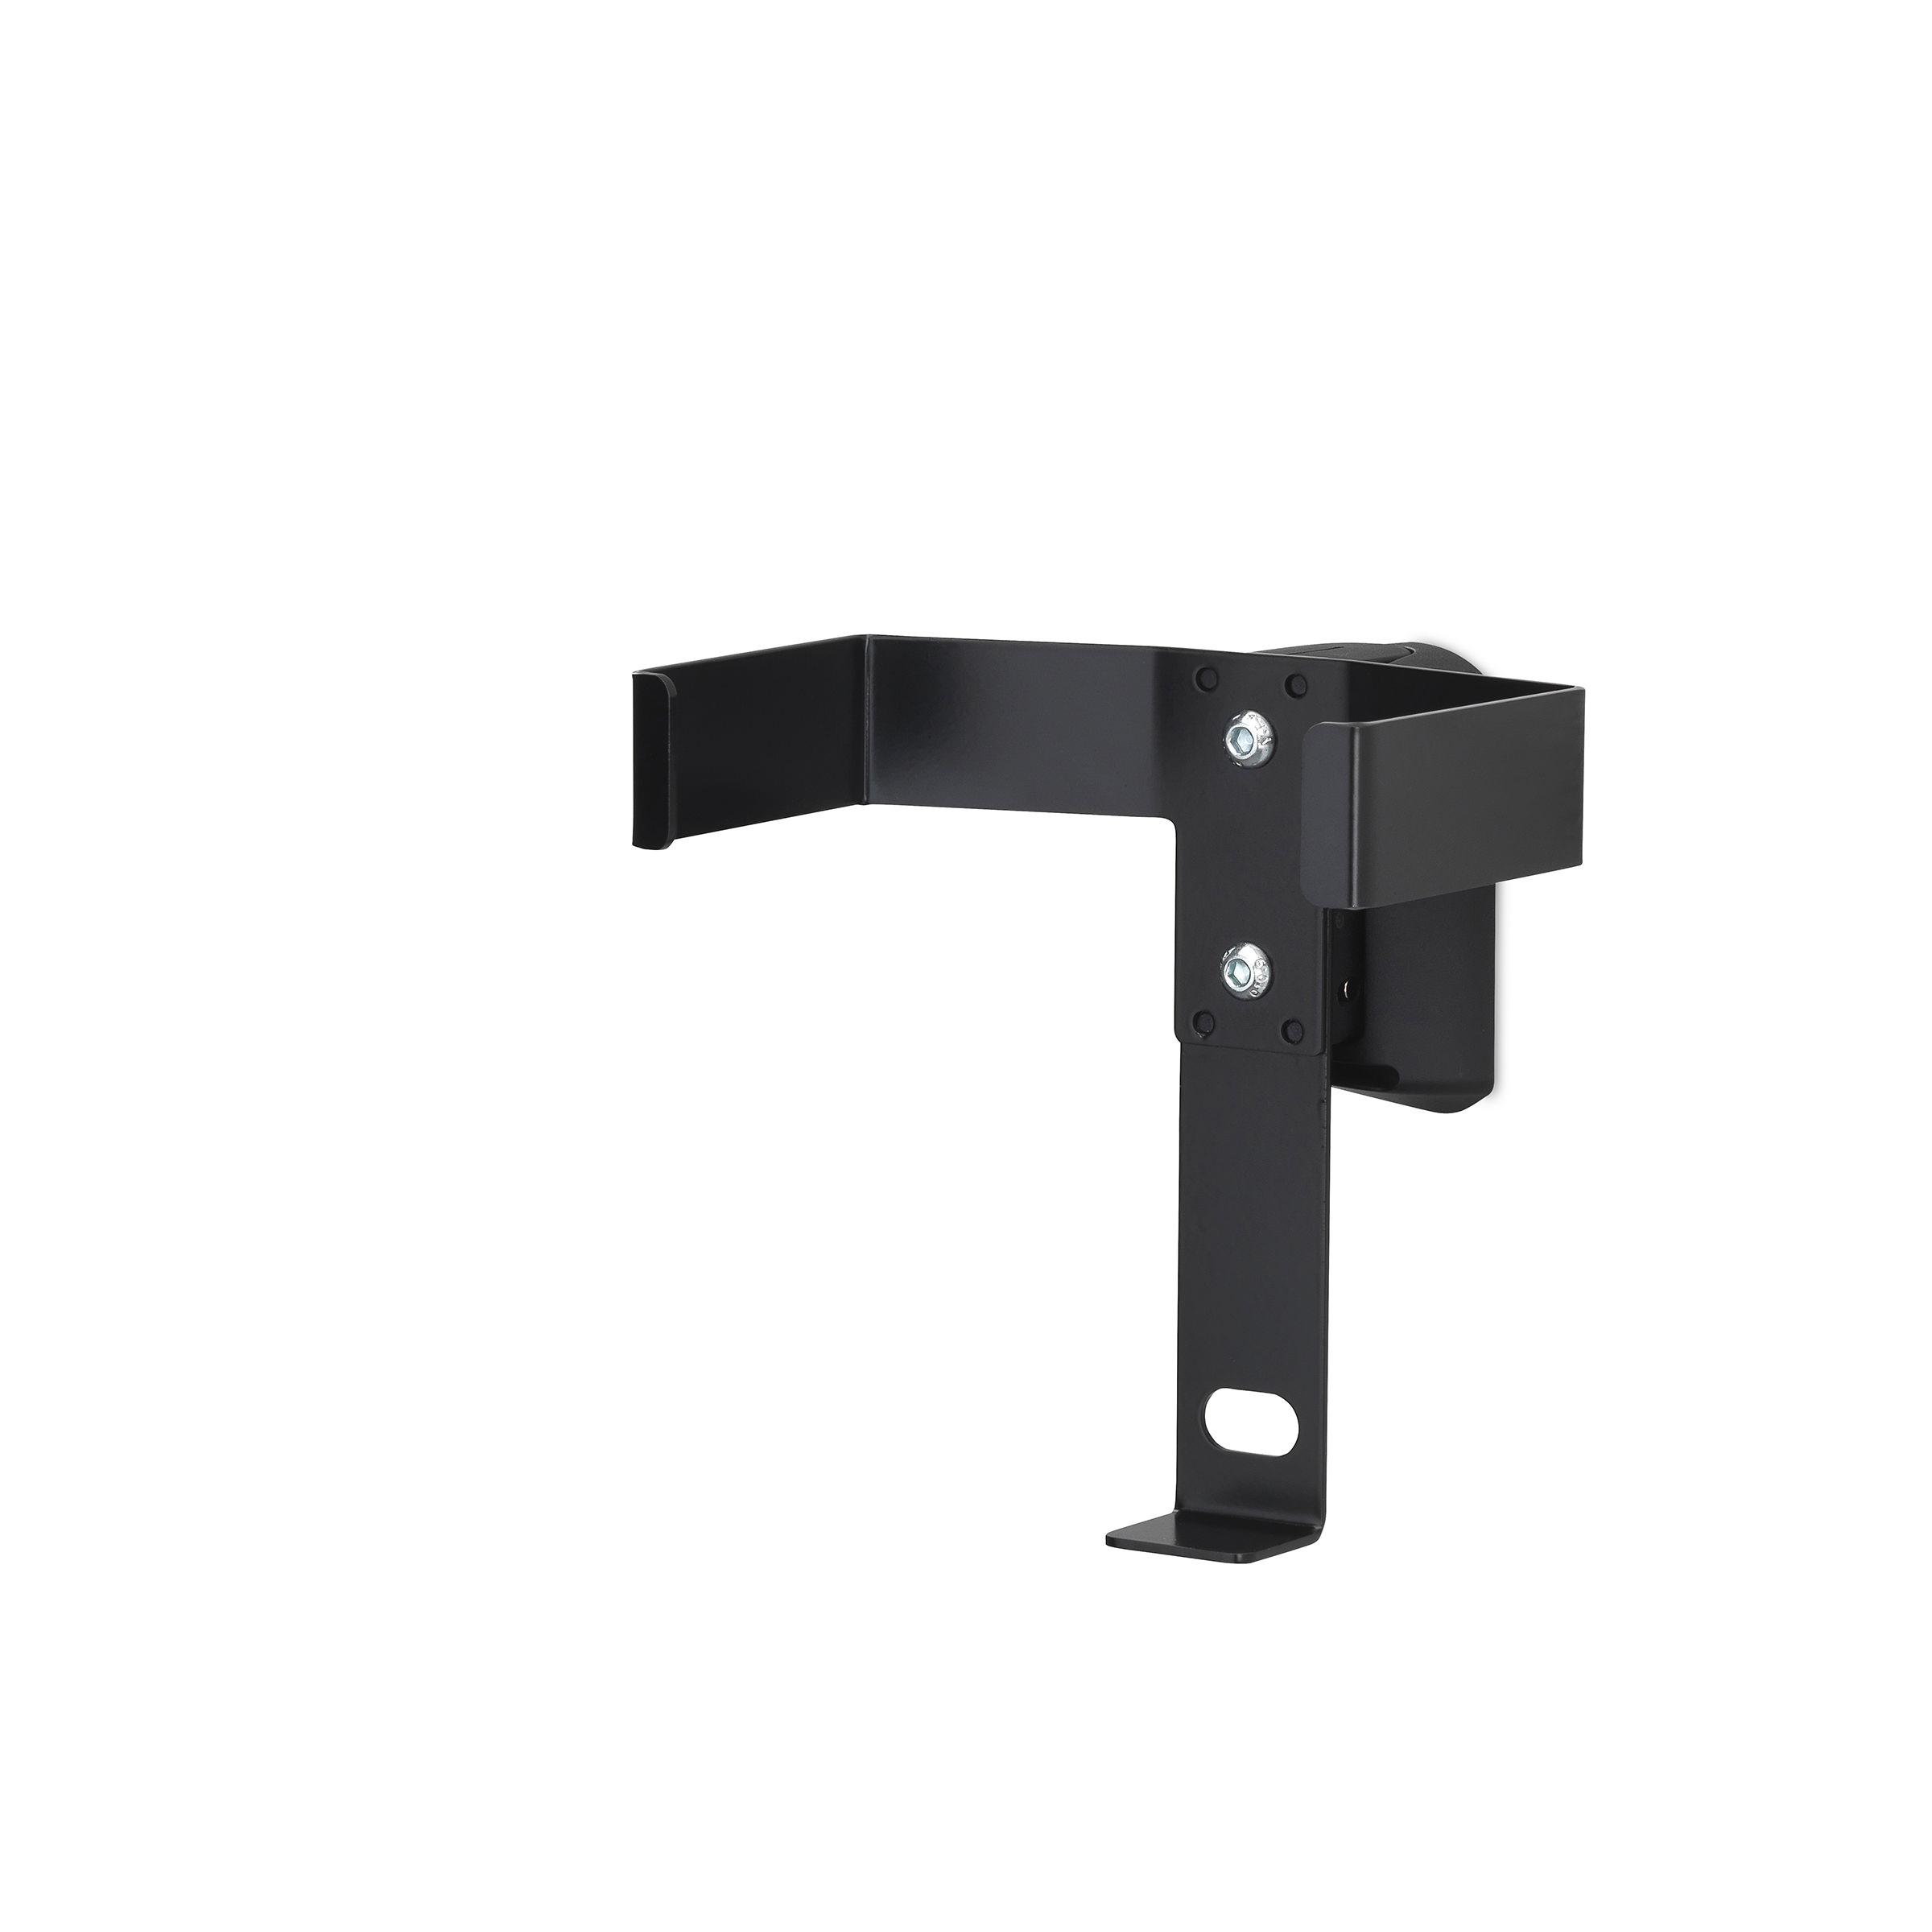 Bose SoundTouch 10 Muurbeugel zwart 11